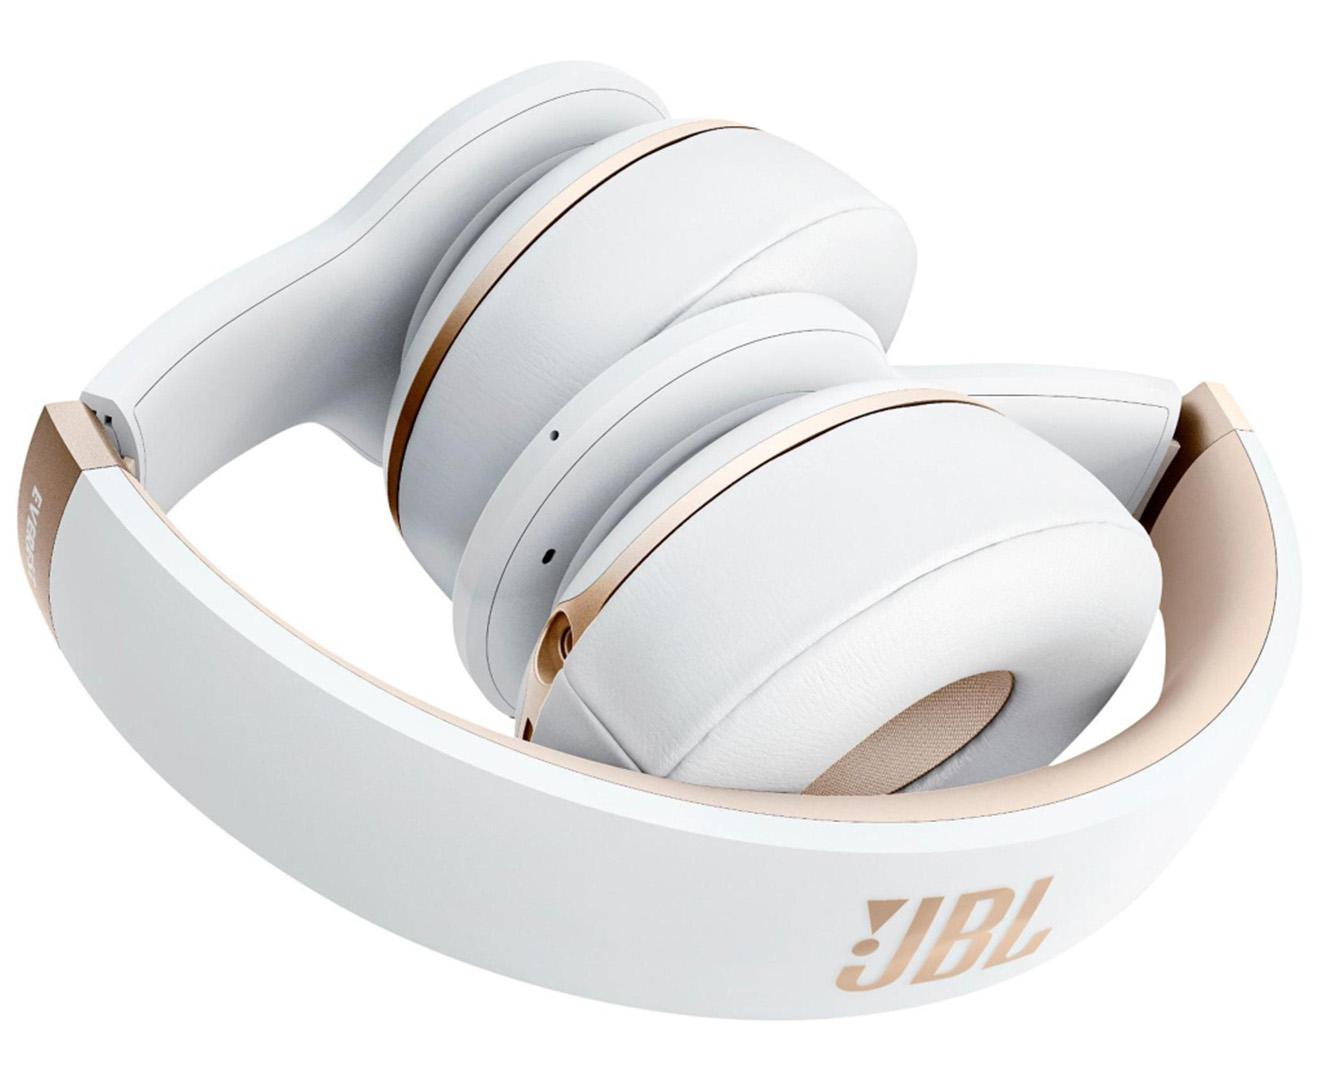 Earphones bluetooth wireless travel - wireless earphones case